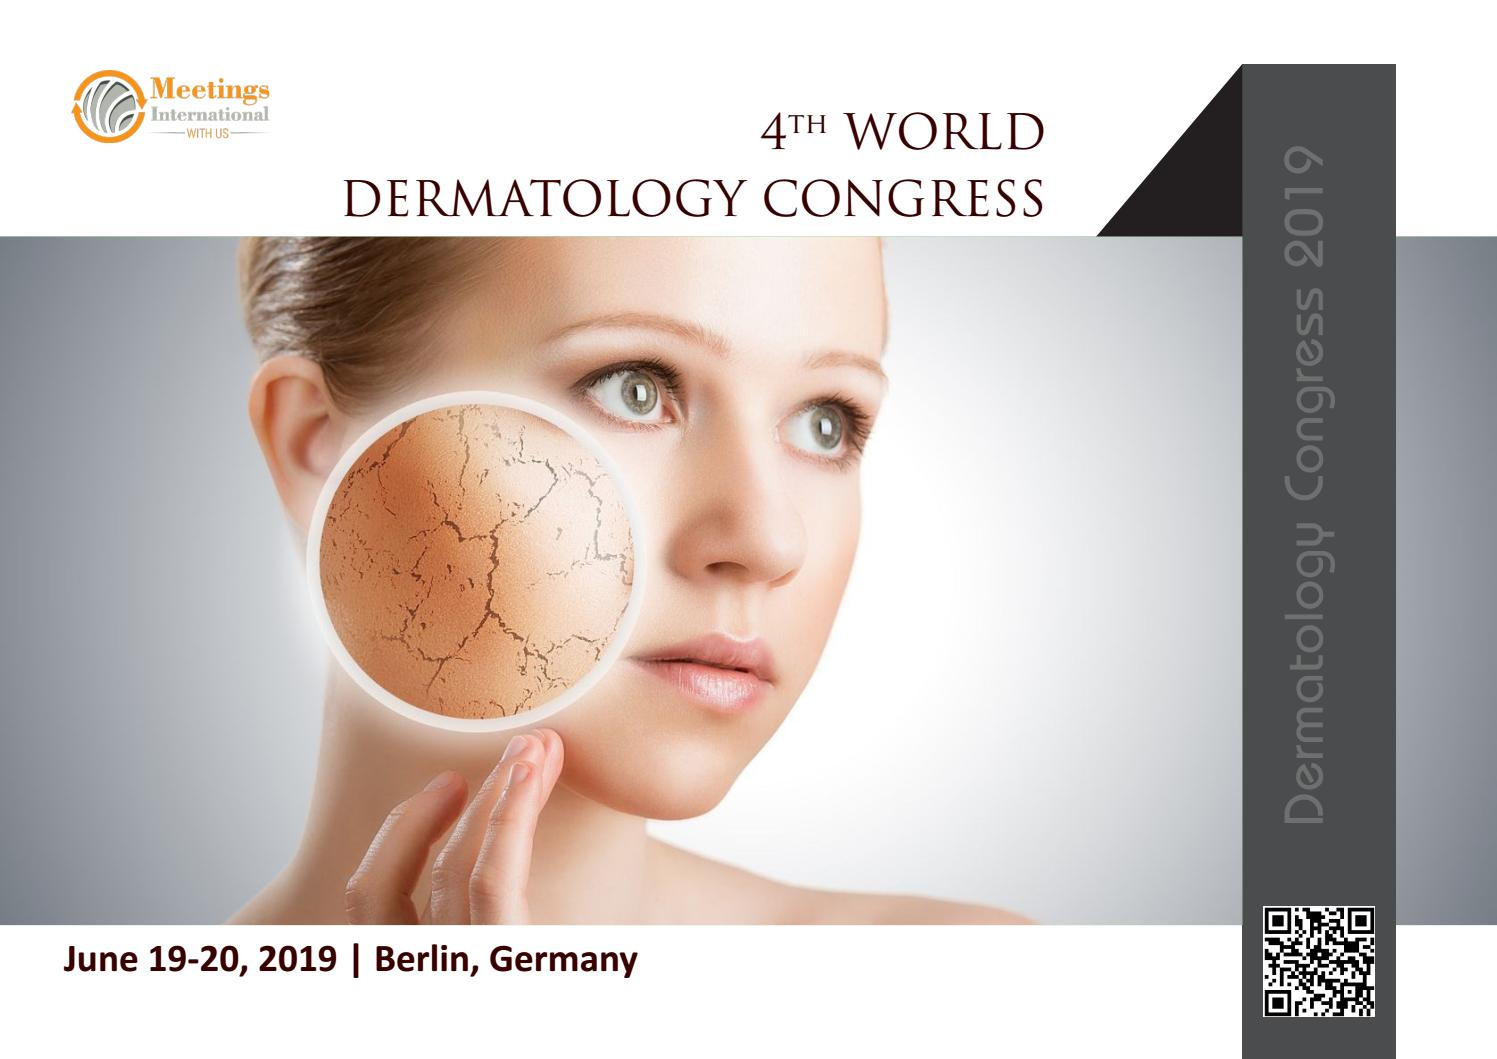 4th World Dermatology Congress 2019 by